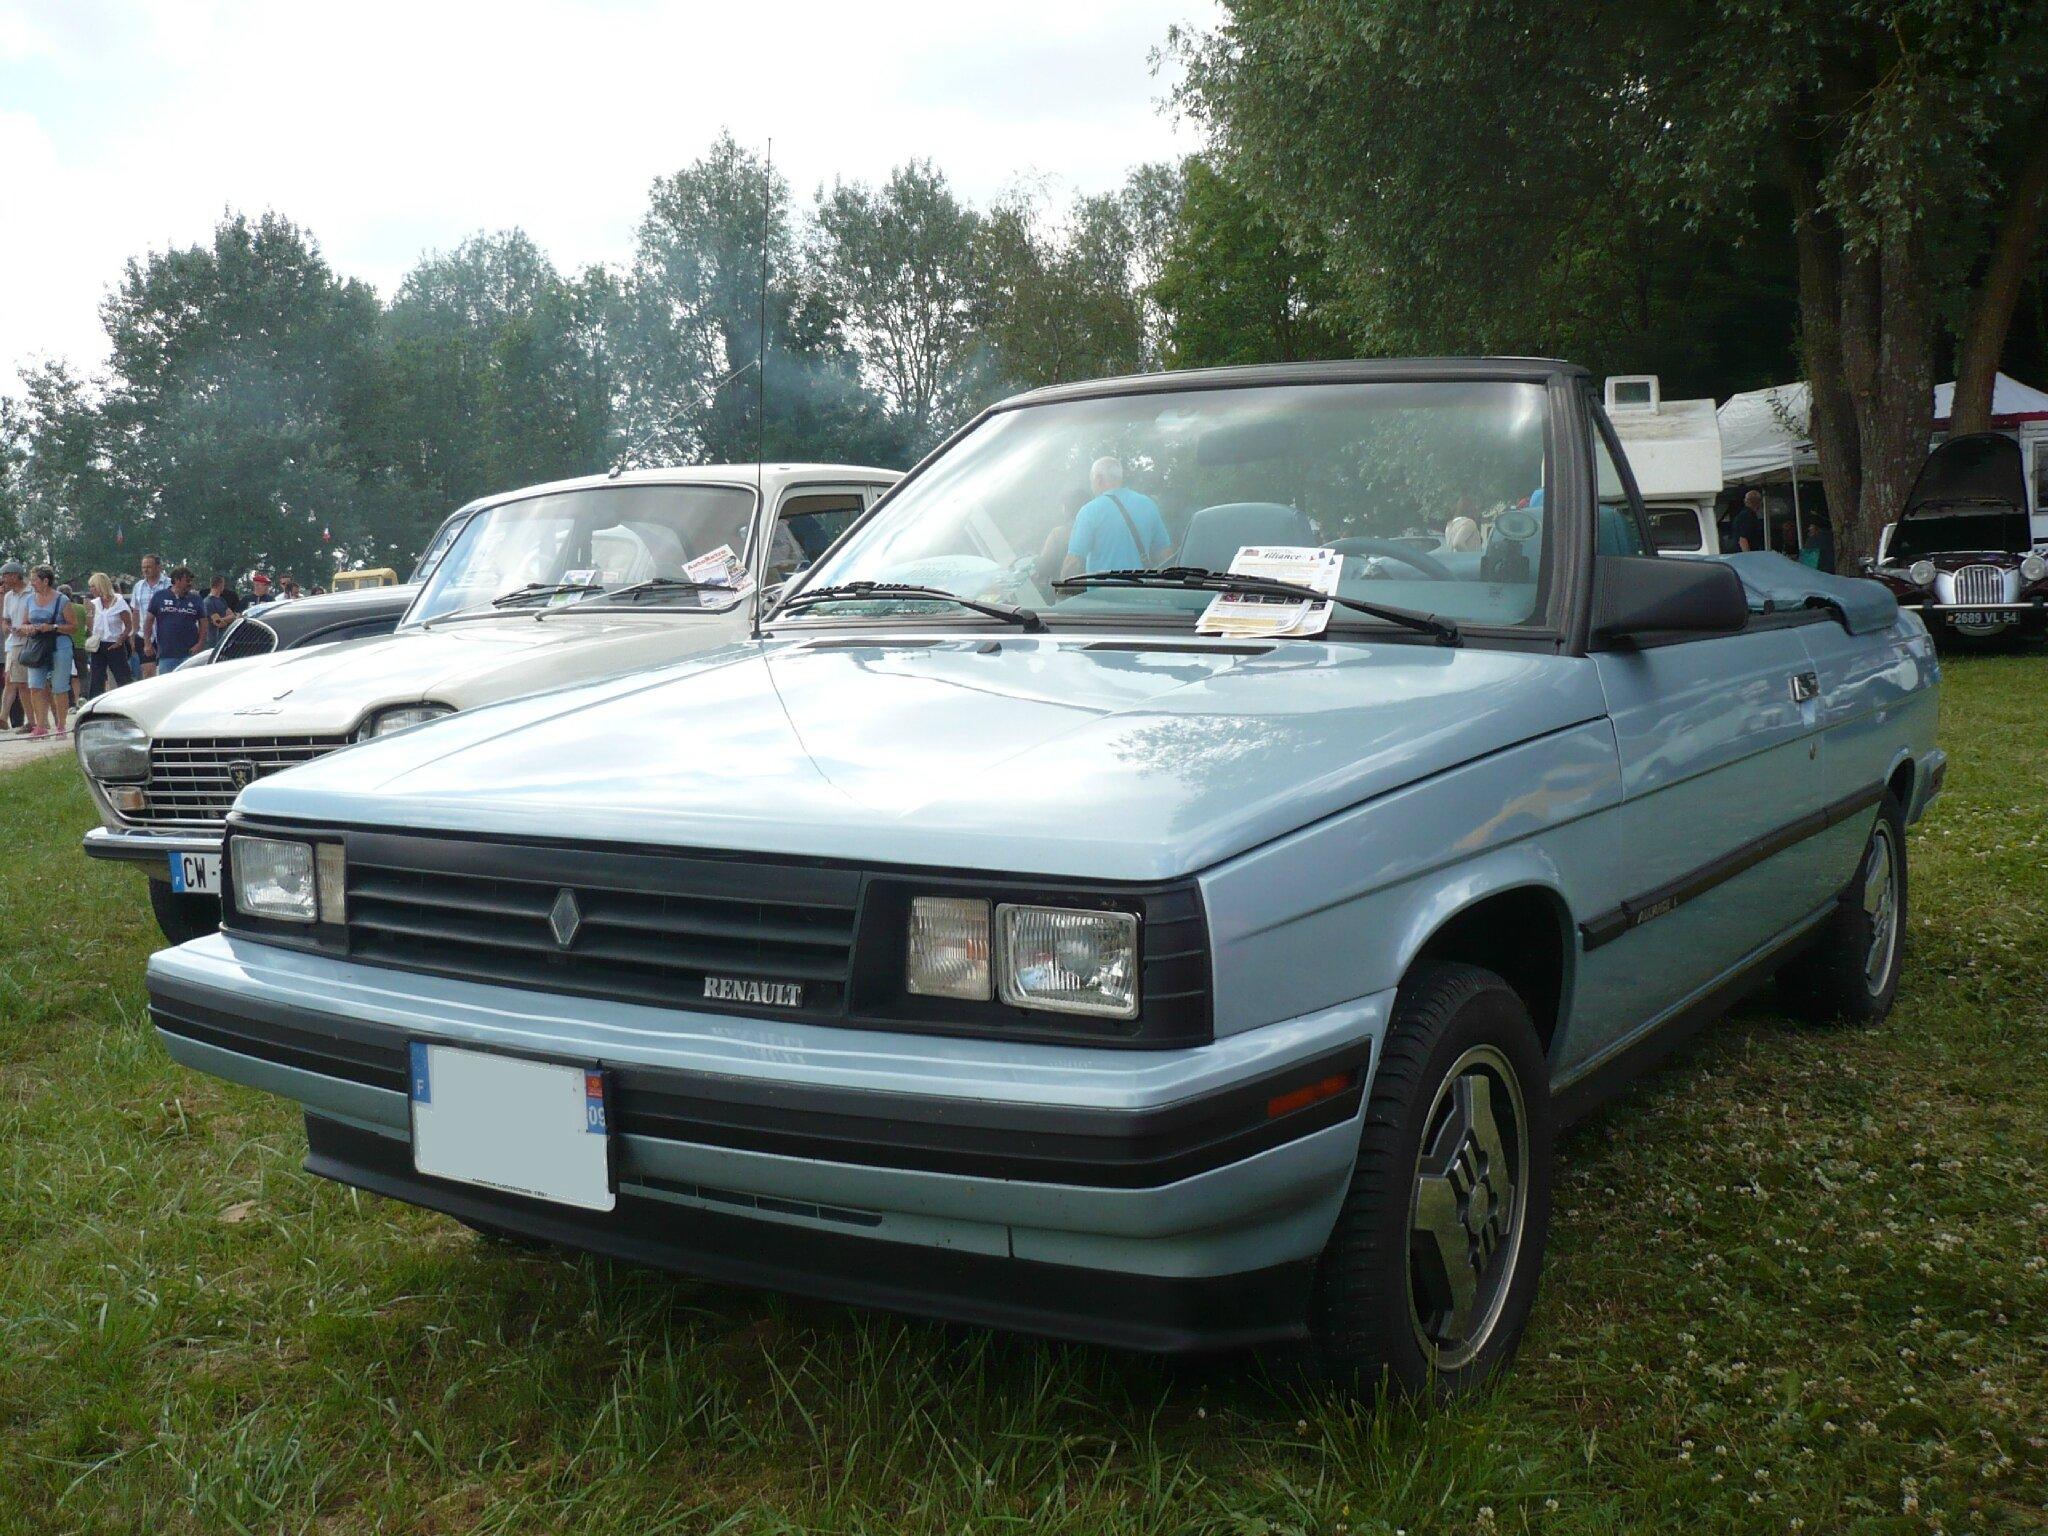 RENAULT - AMC Alliance L cabriolet 1987 Madine (1)